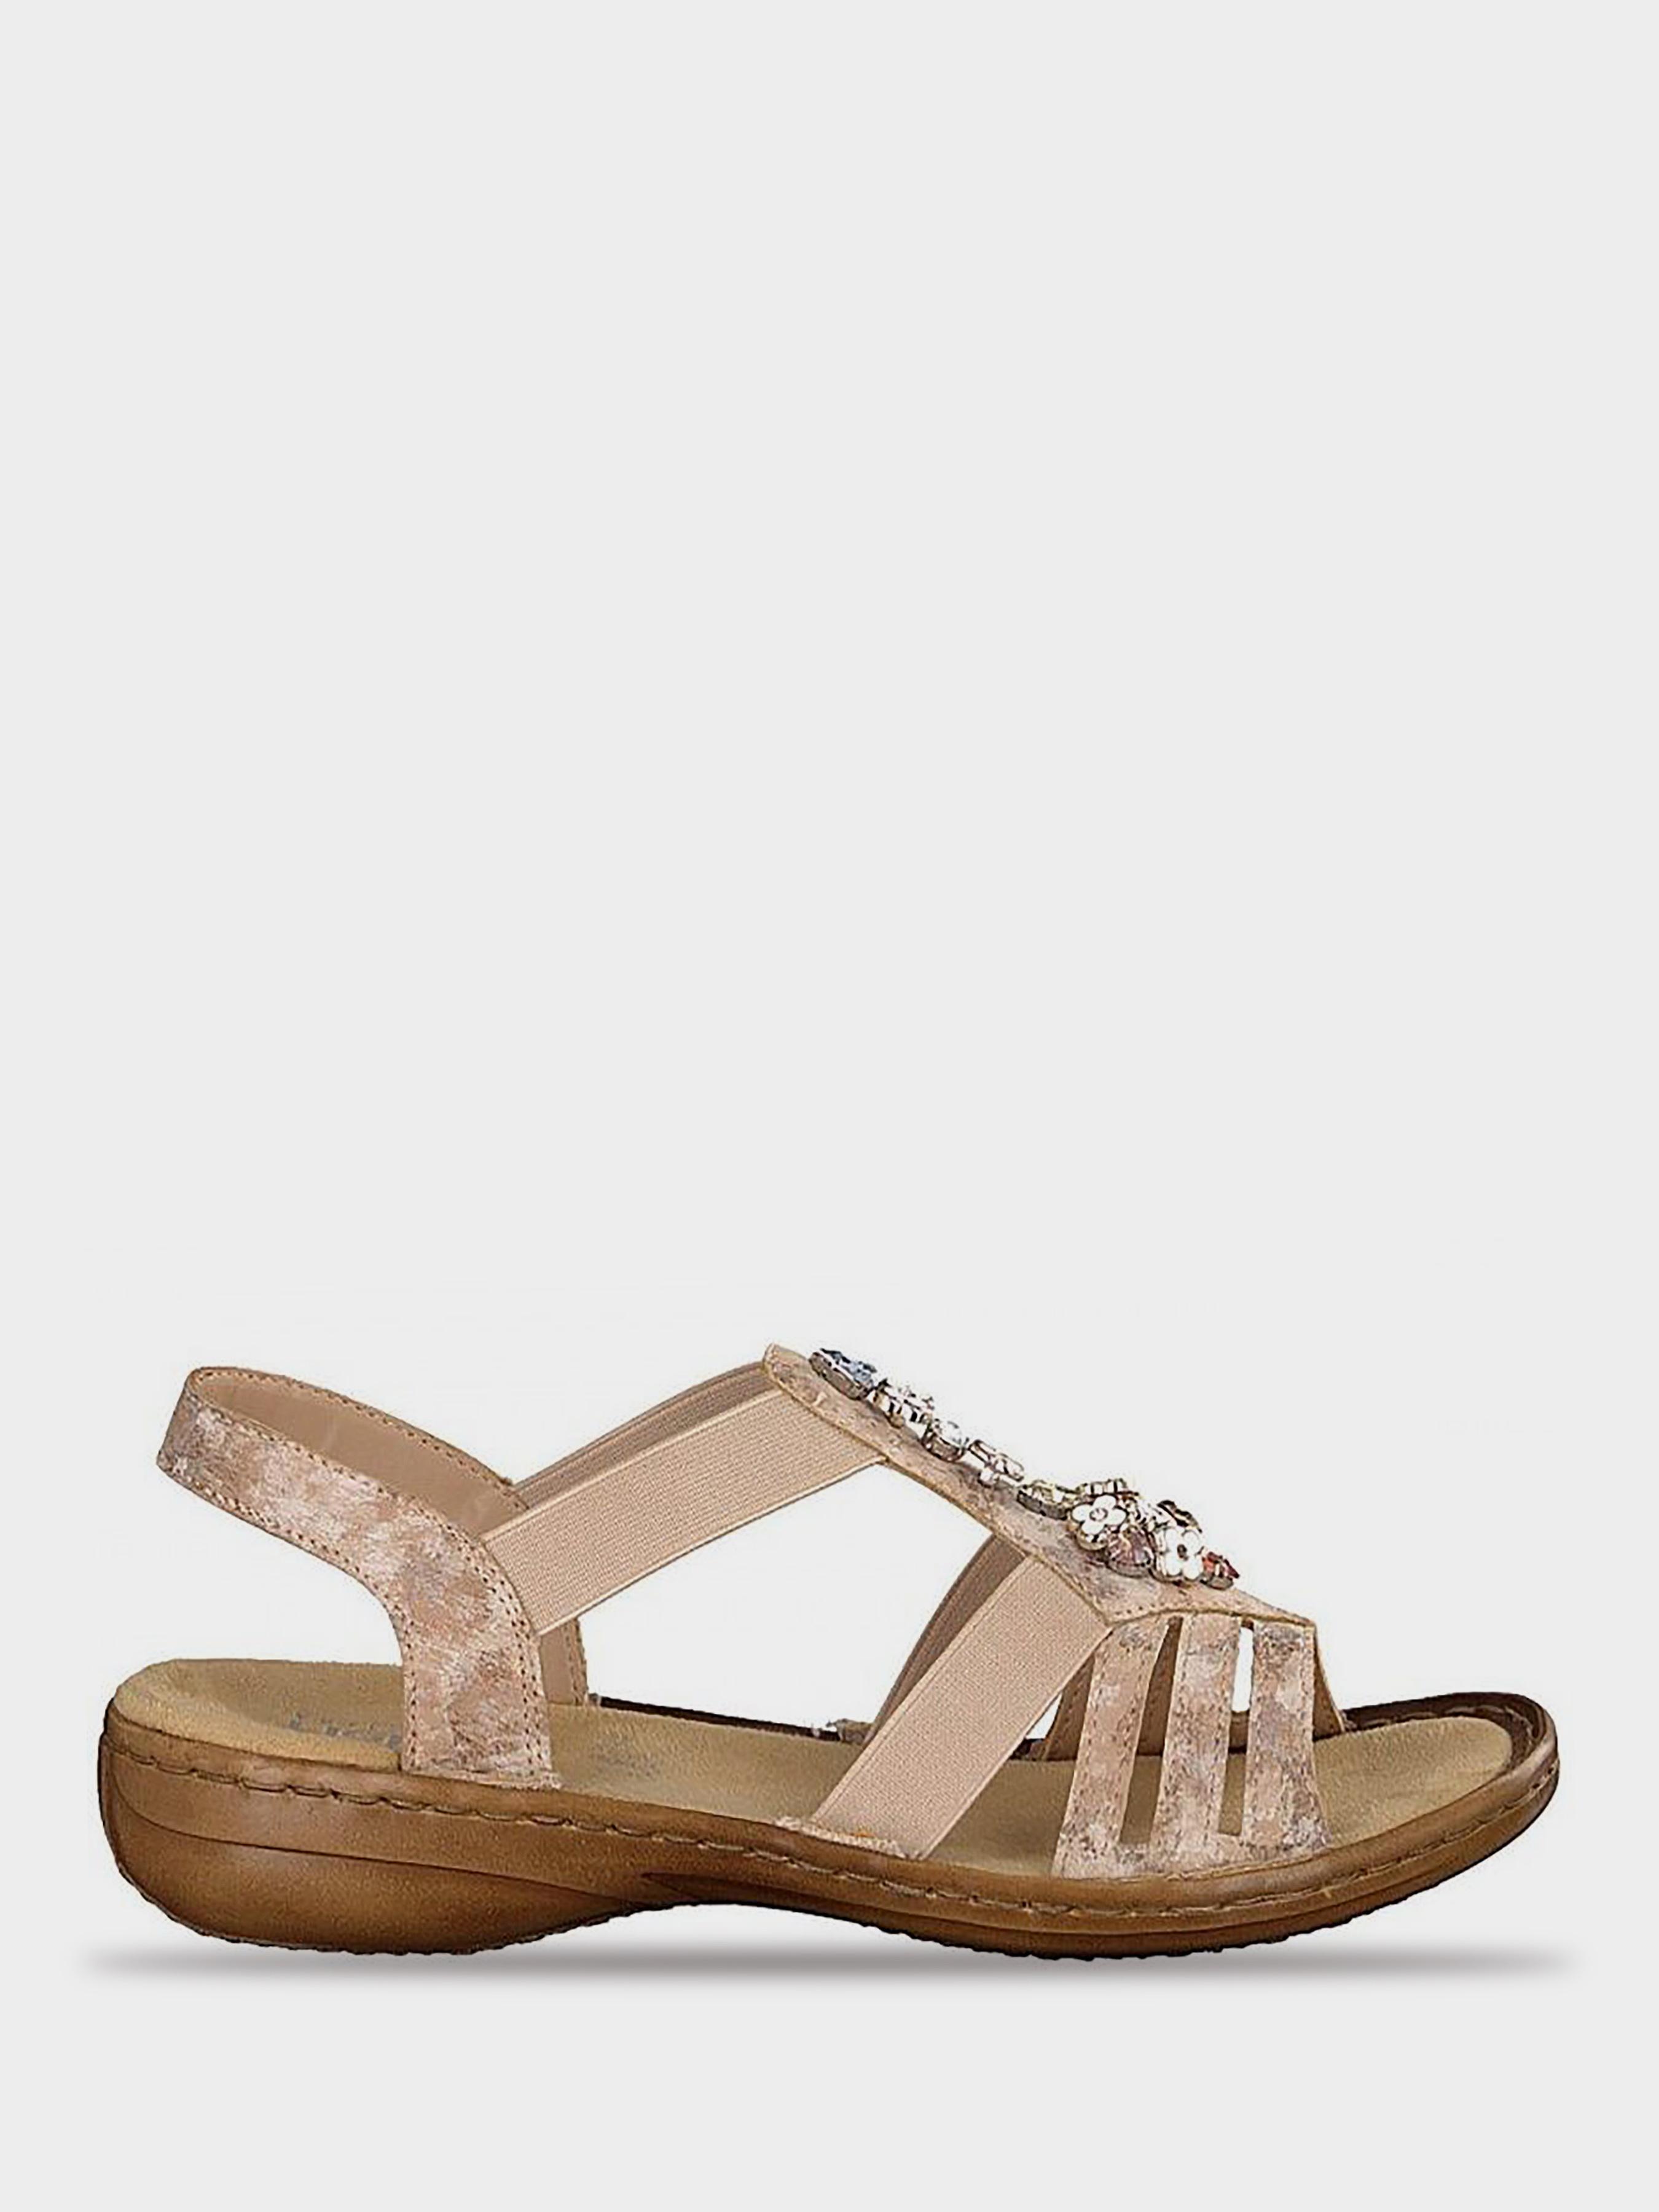 Сандалии для женщин RIEKER RW1214 размерная сетка обуви, 2017